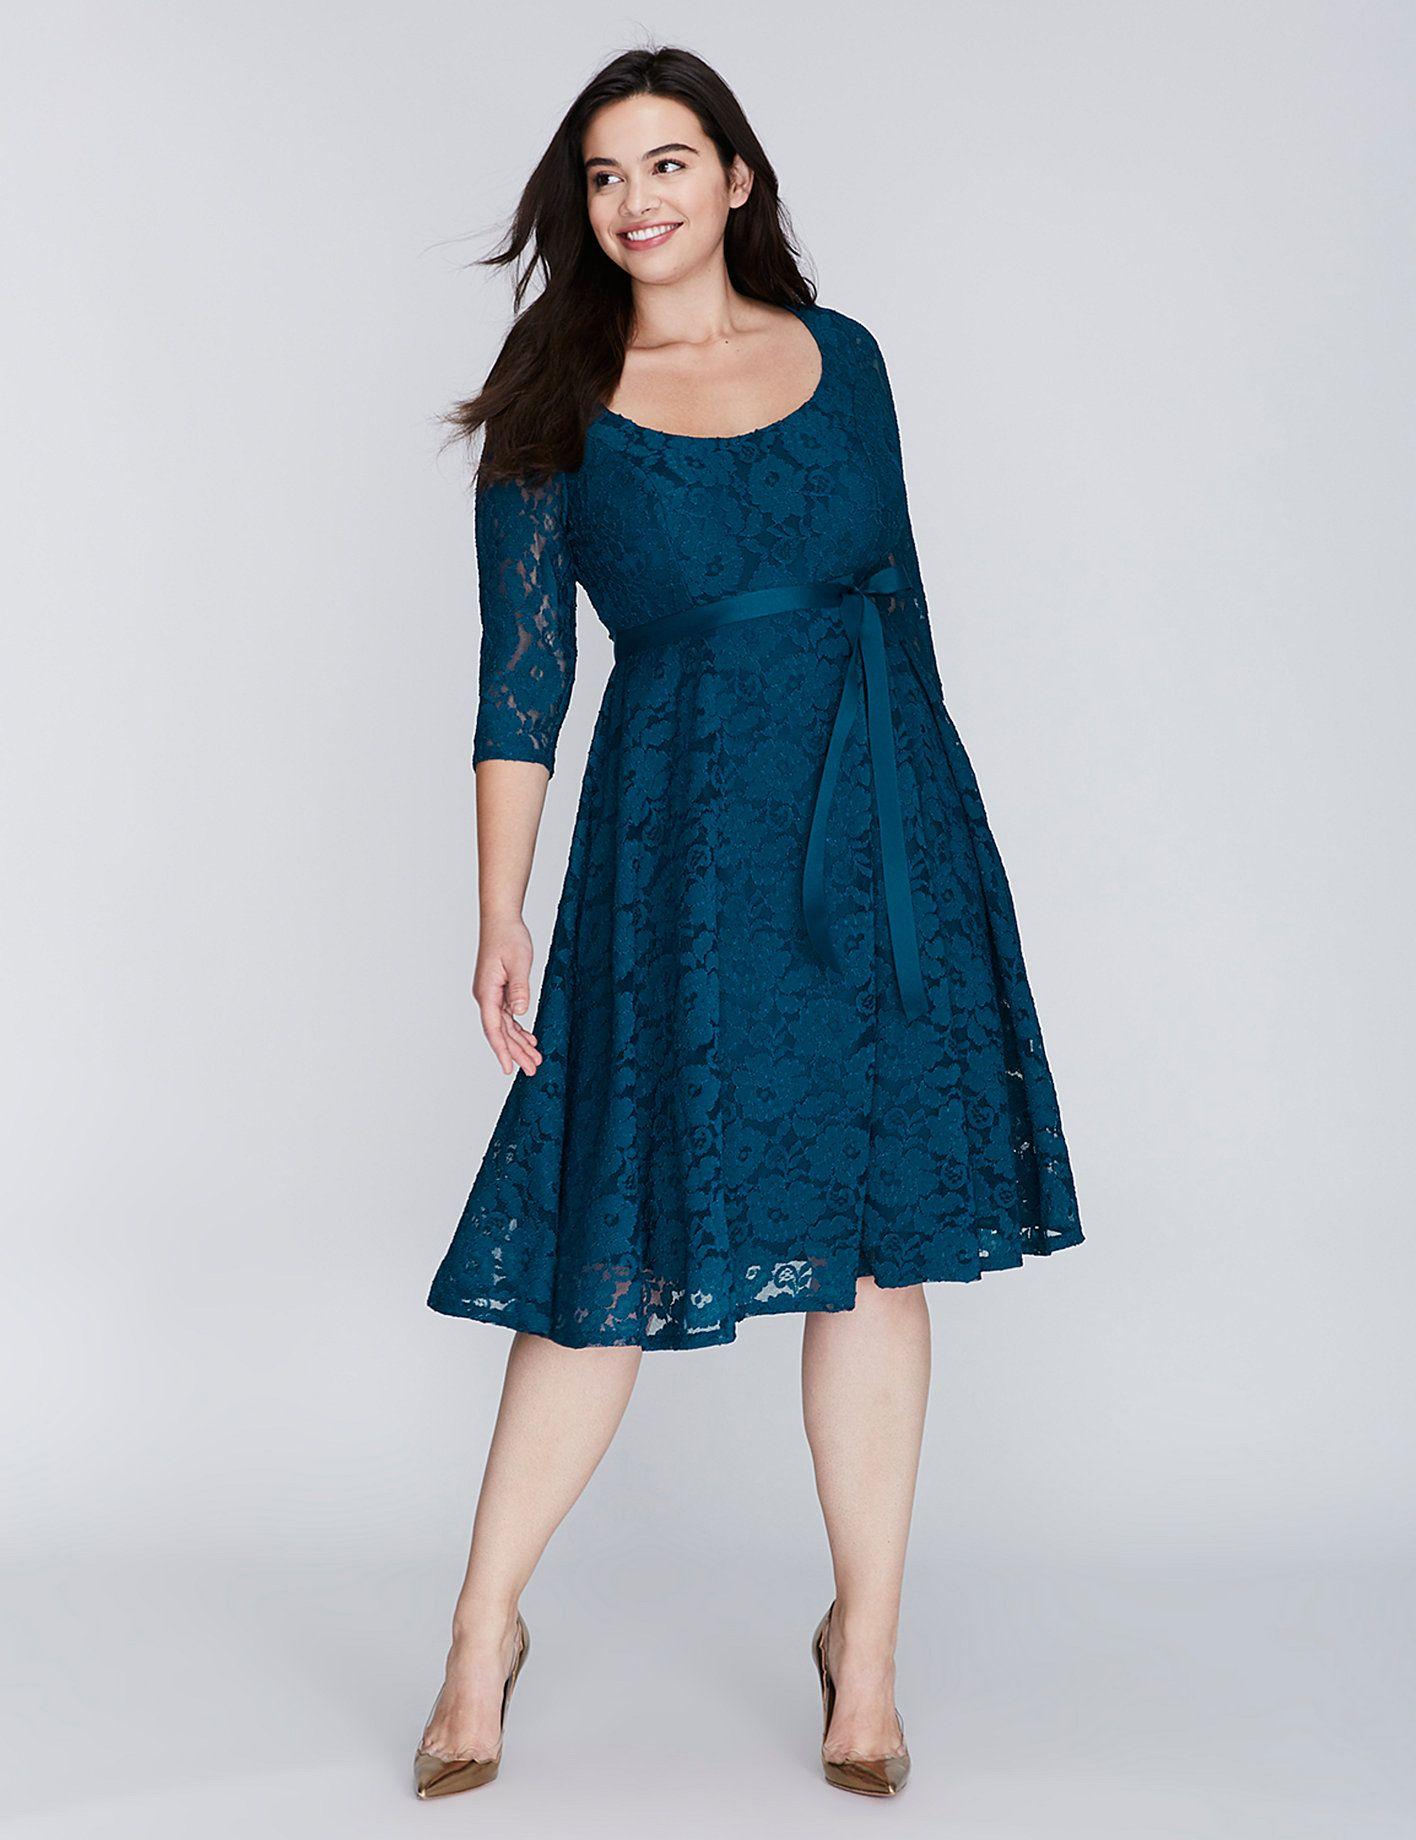 Shop Plus Size Dresses Sizes 14 28 Lane Bryant Riley Ticotin